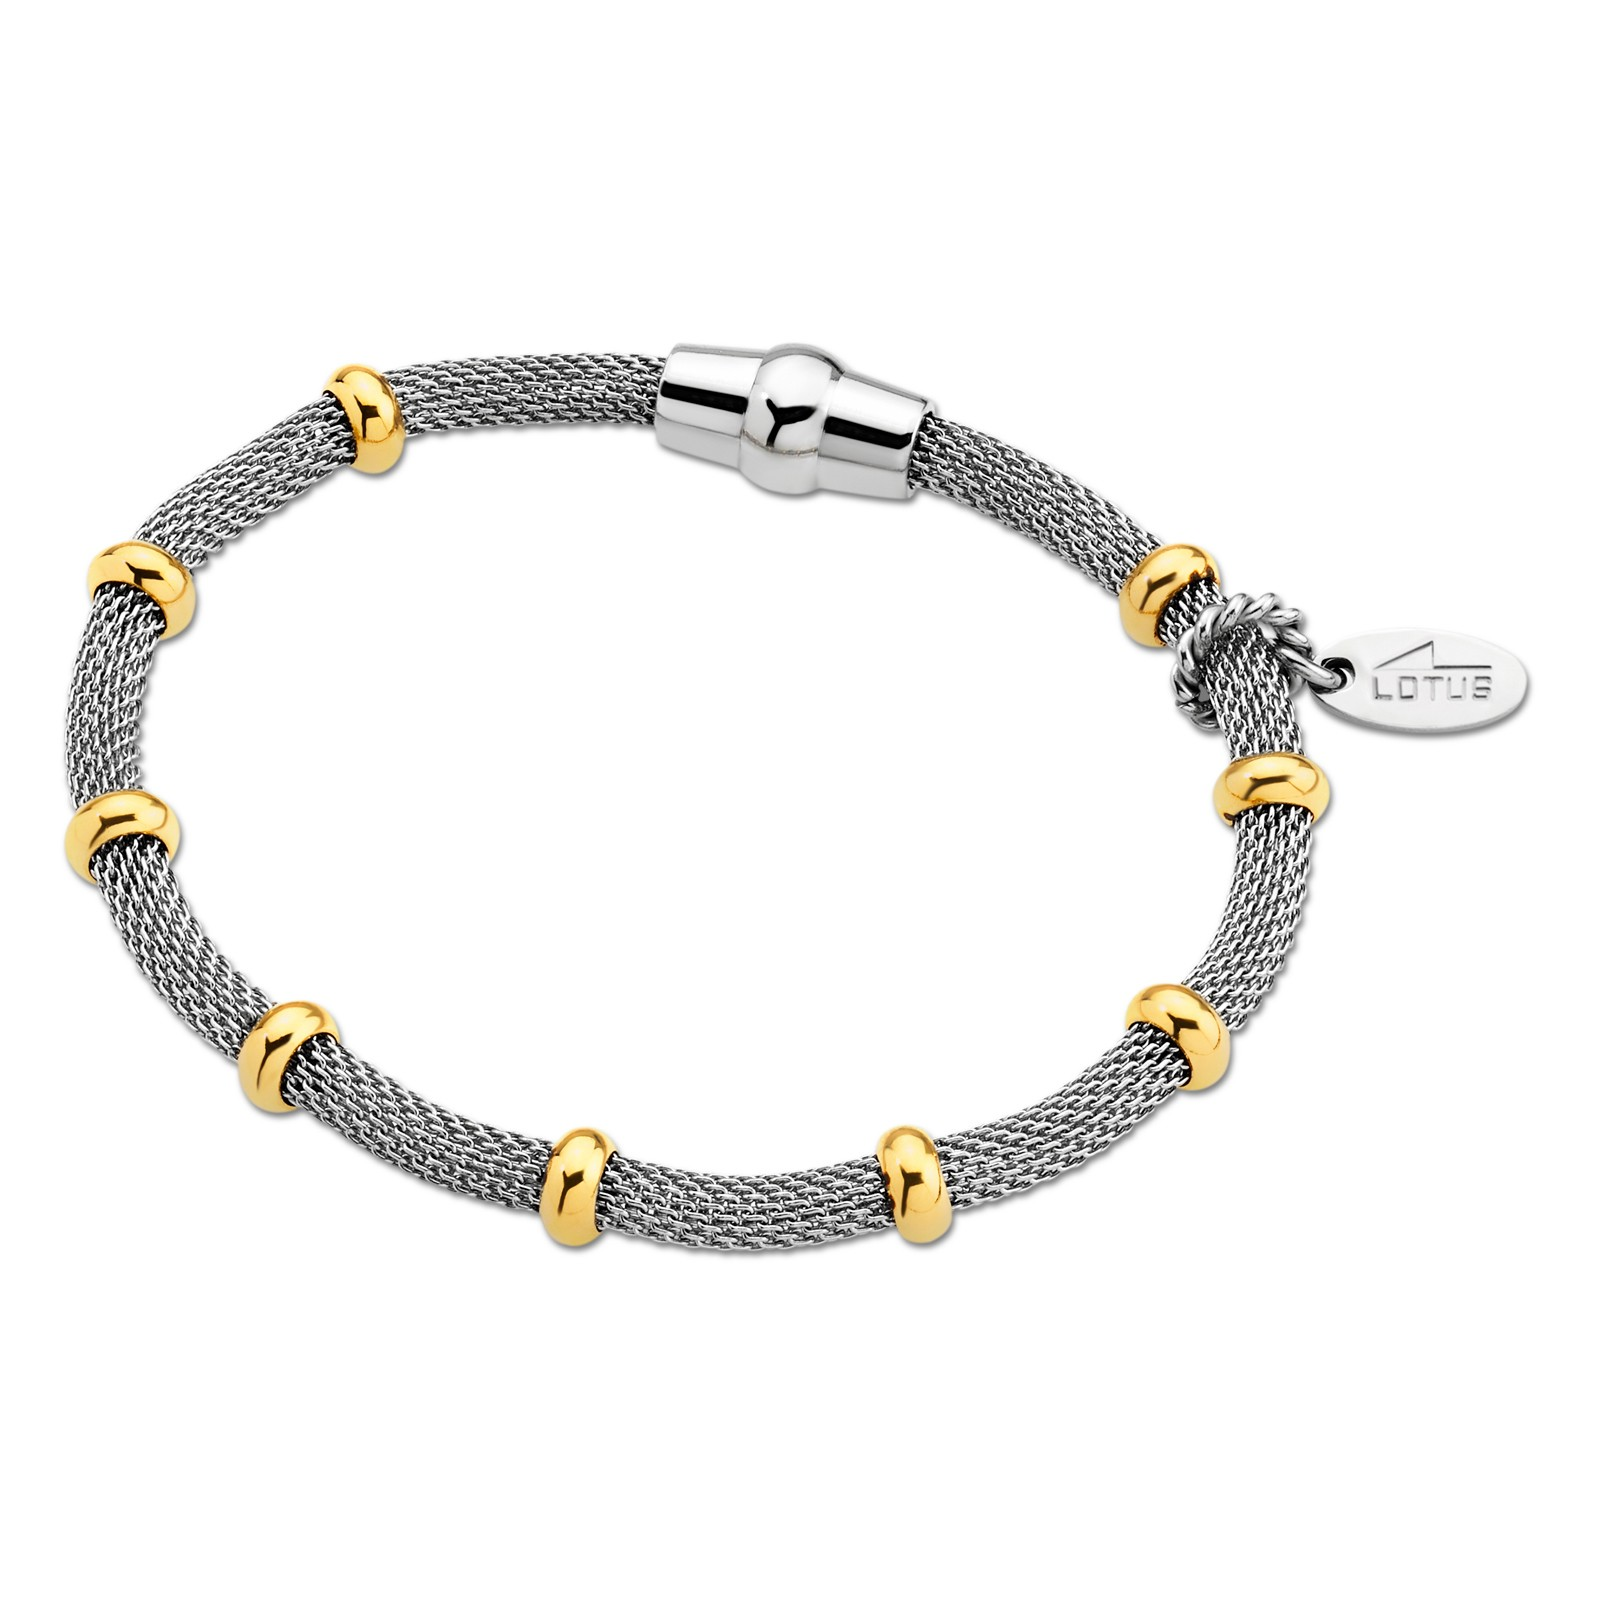 LOTUS Style Damen Armband Trendy-Kollektion Edelstahl JLS1680-2-2